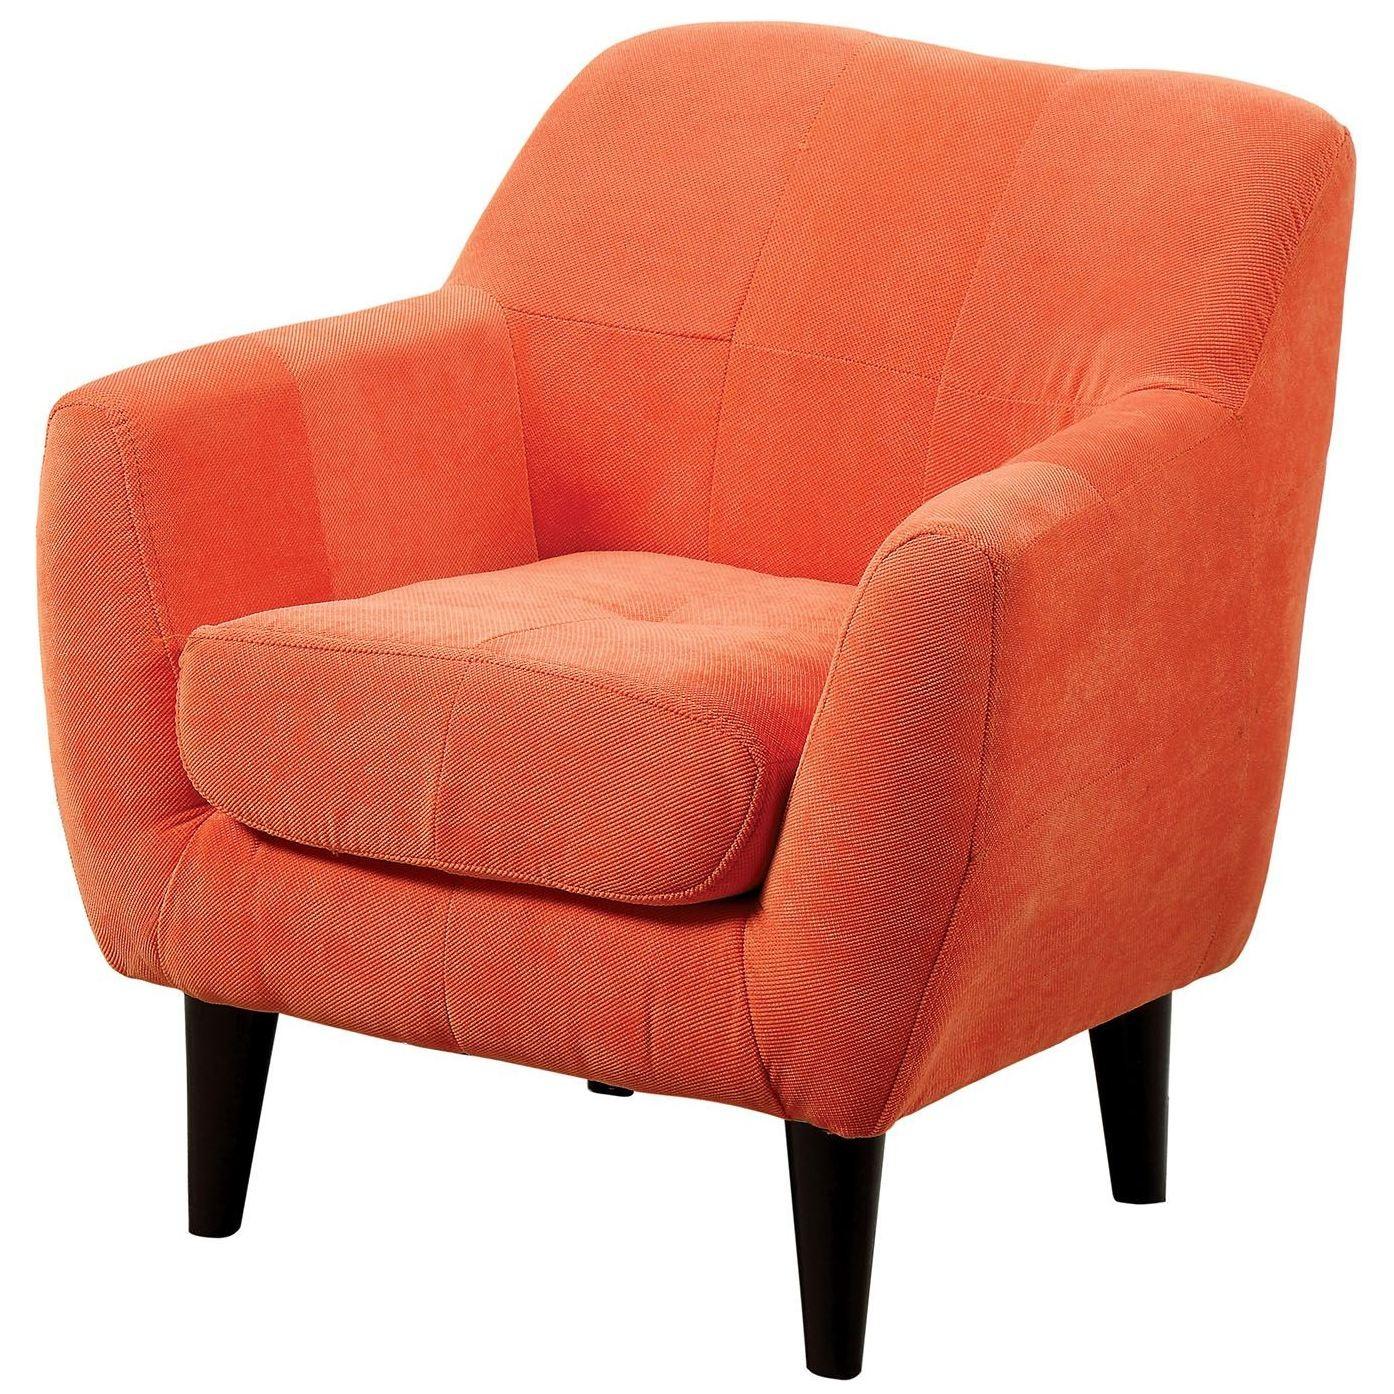 Heidi orange kids chair from furniture of america for Orange kids chair